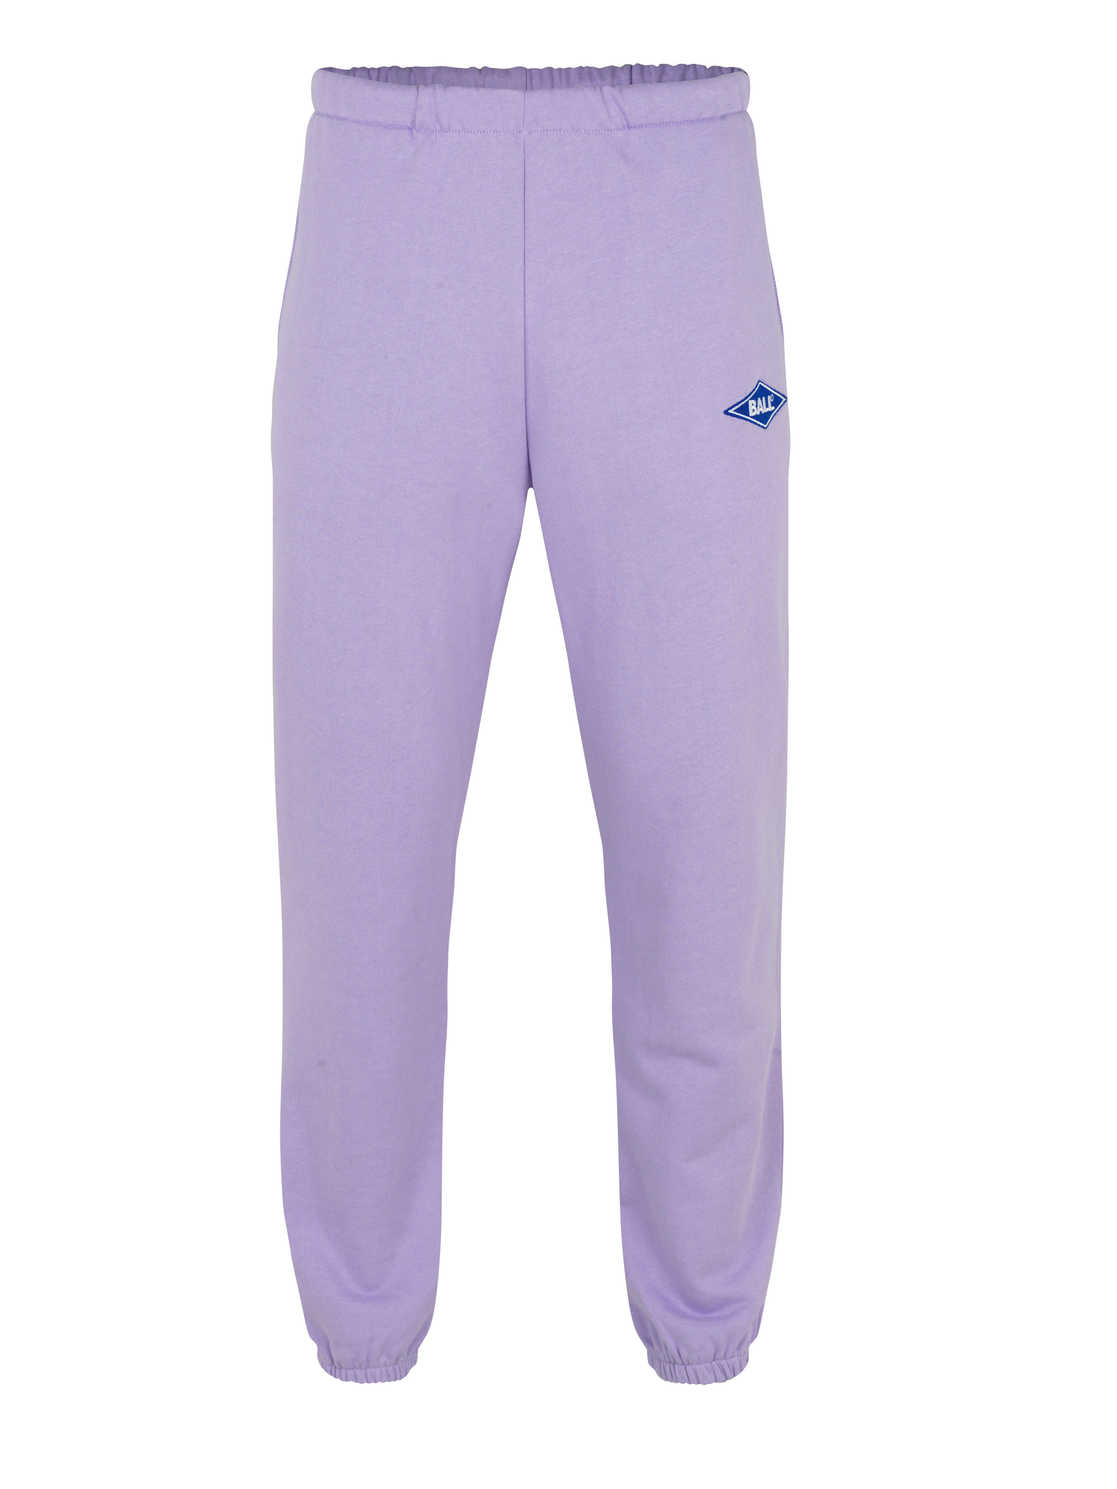 BALL Original Rimini sweatpants, lavender, medium